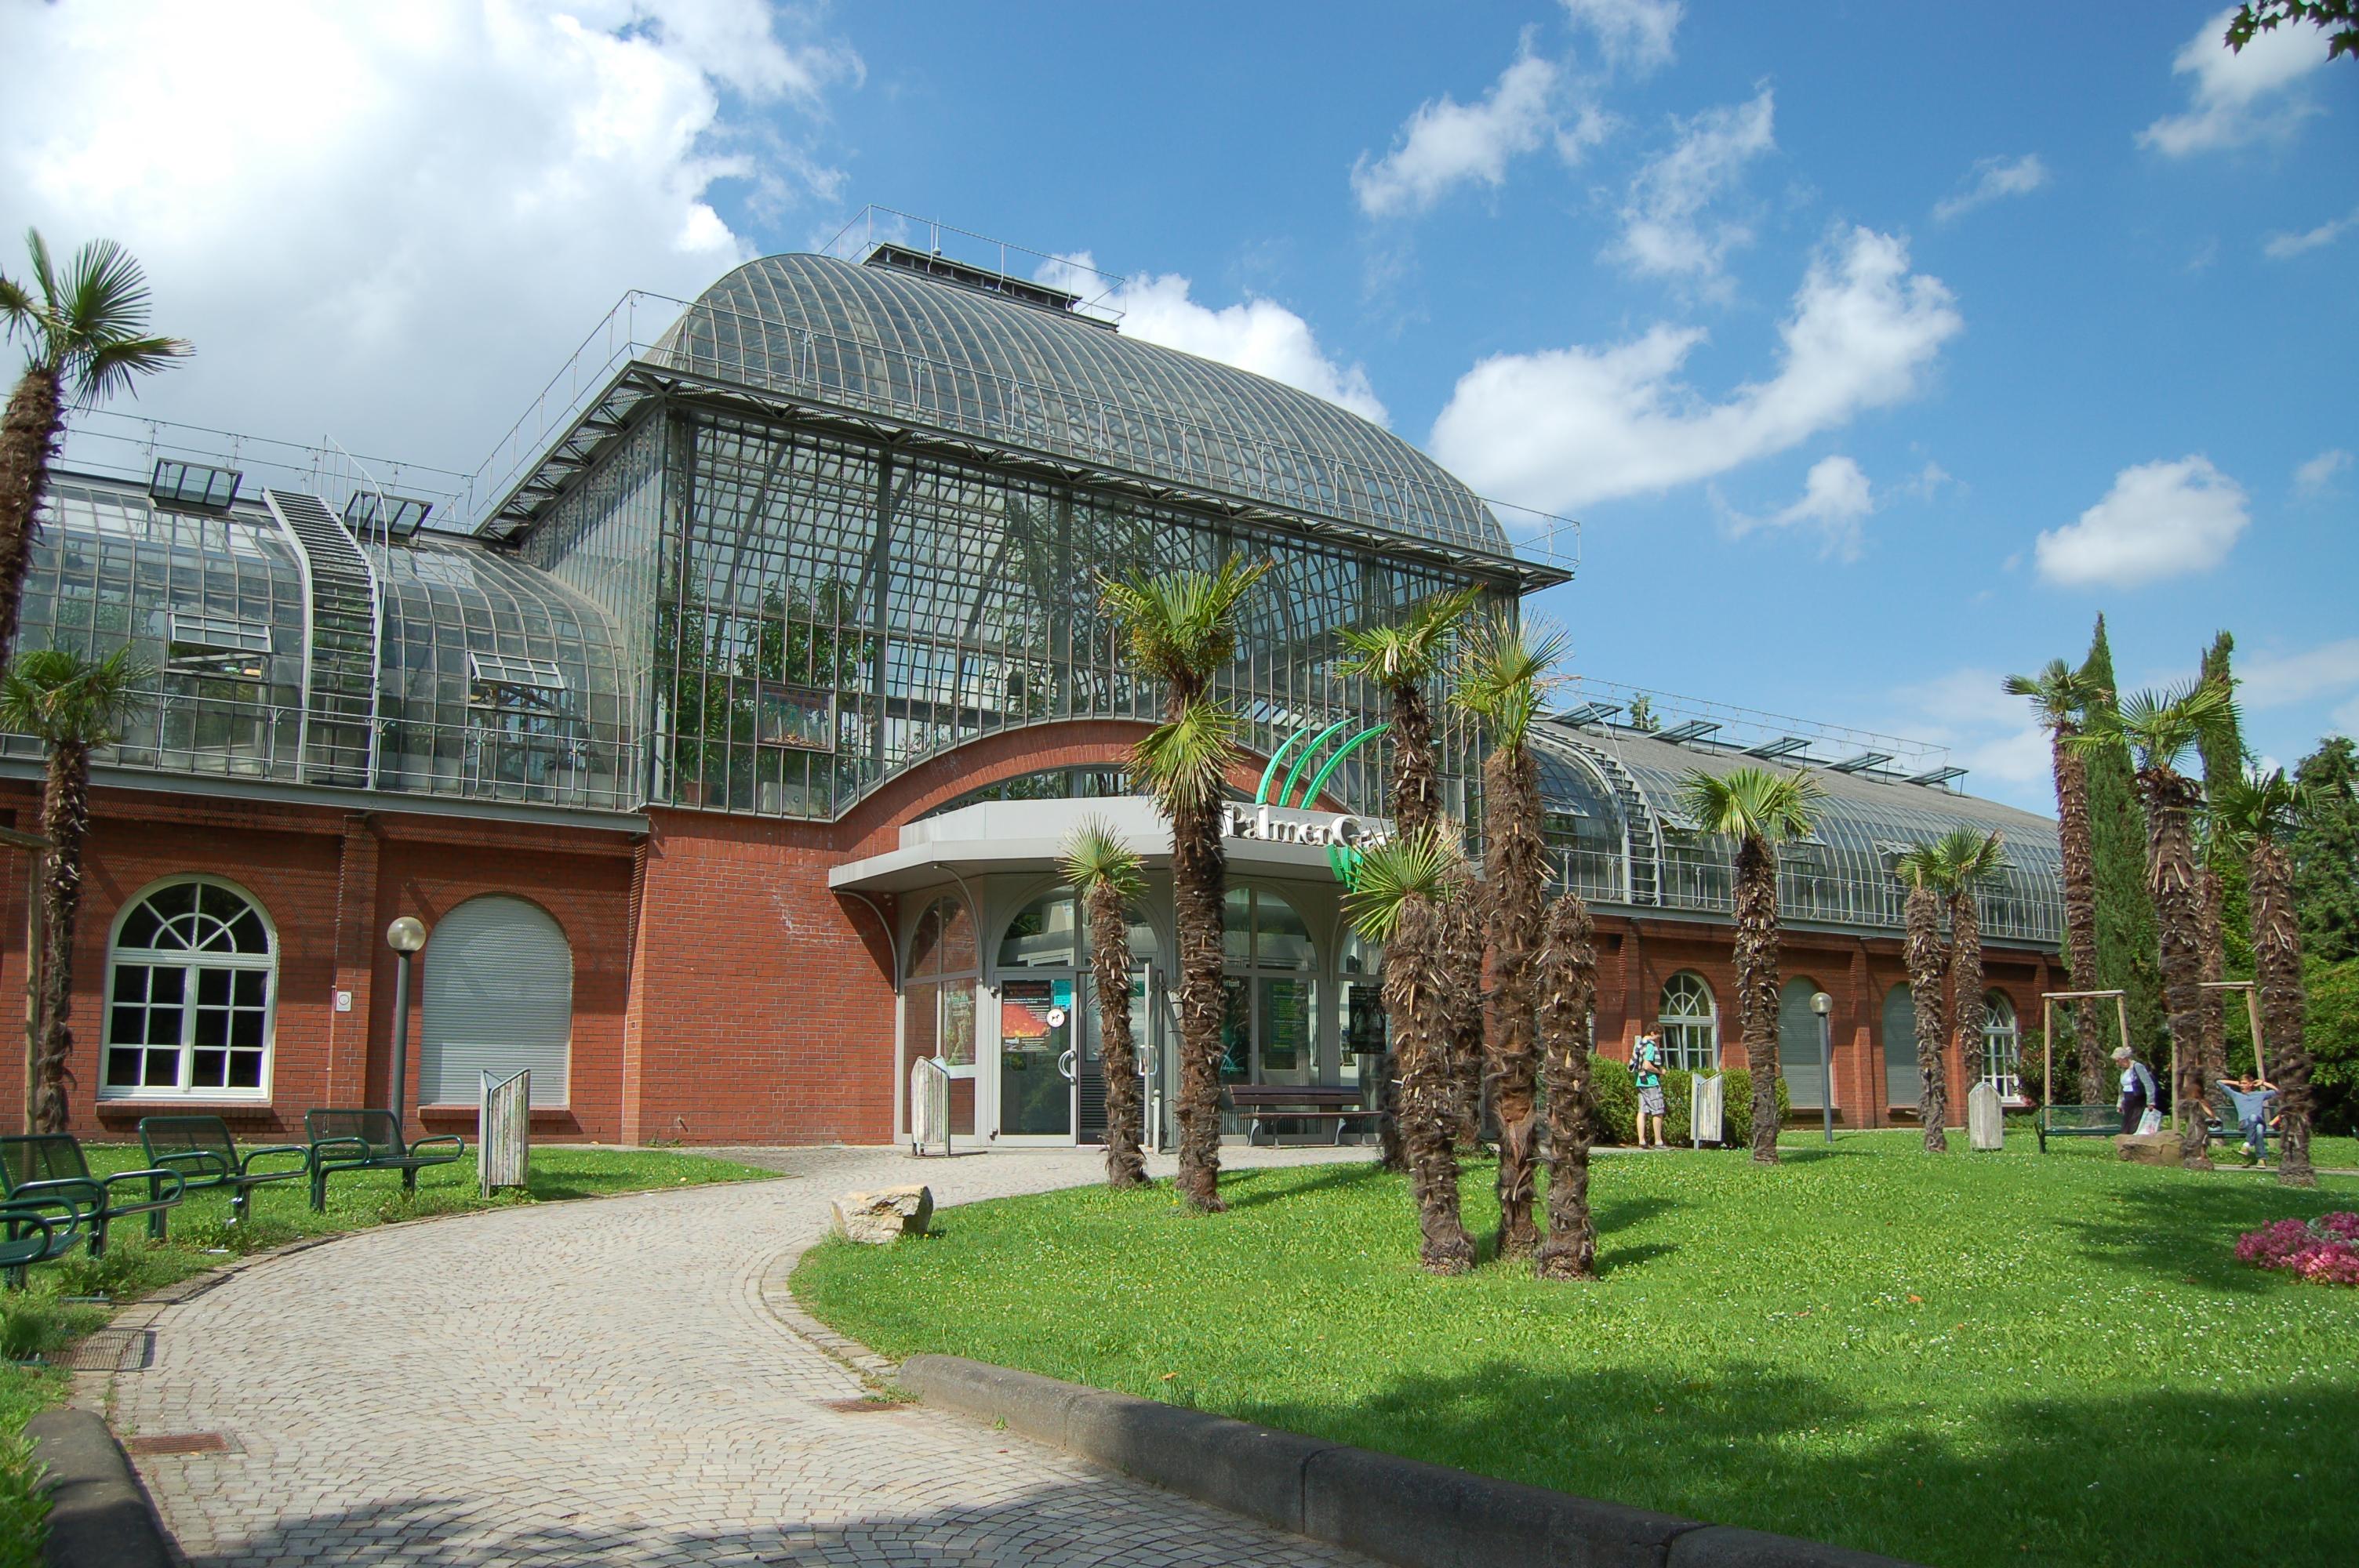 Beautiful Palmengarten Beautiful botanical garden Frankfurt Germany Visited here early